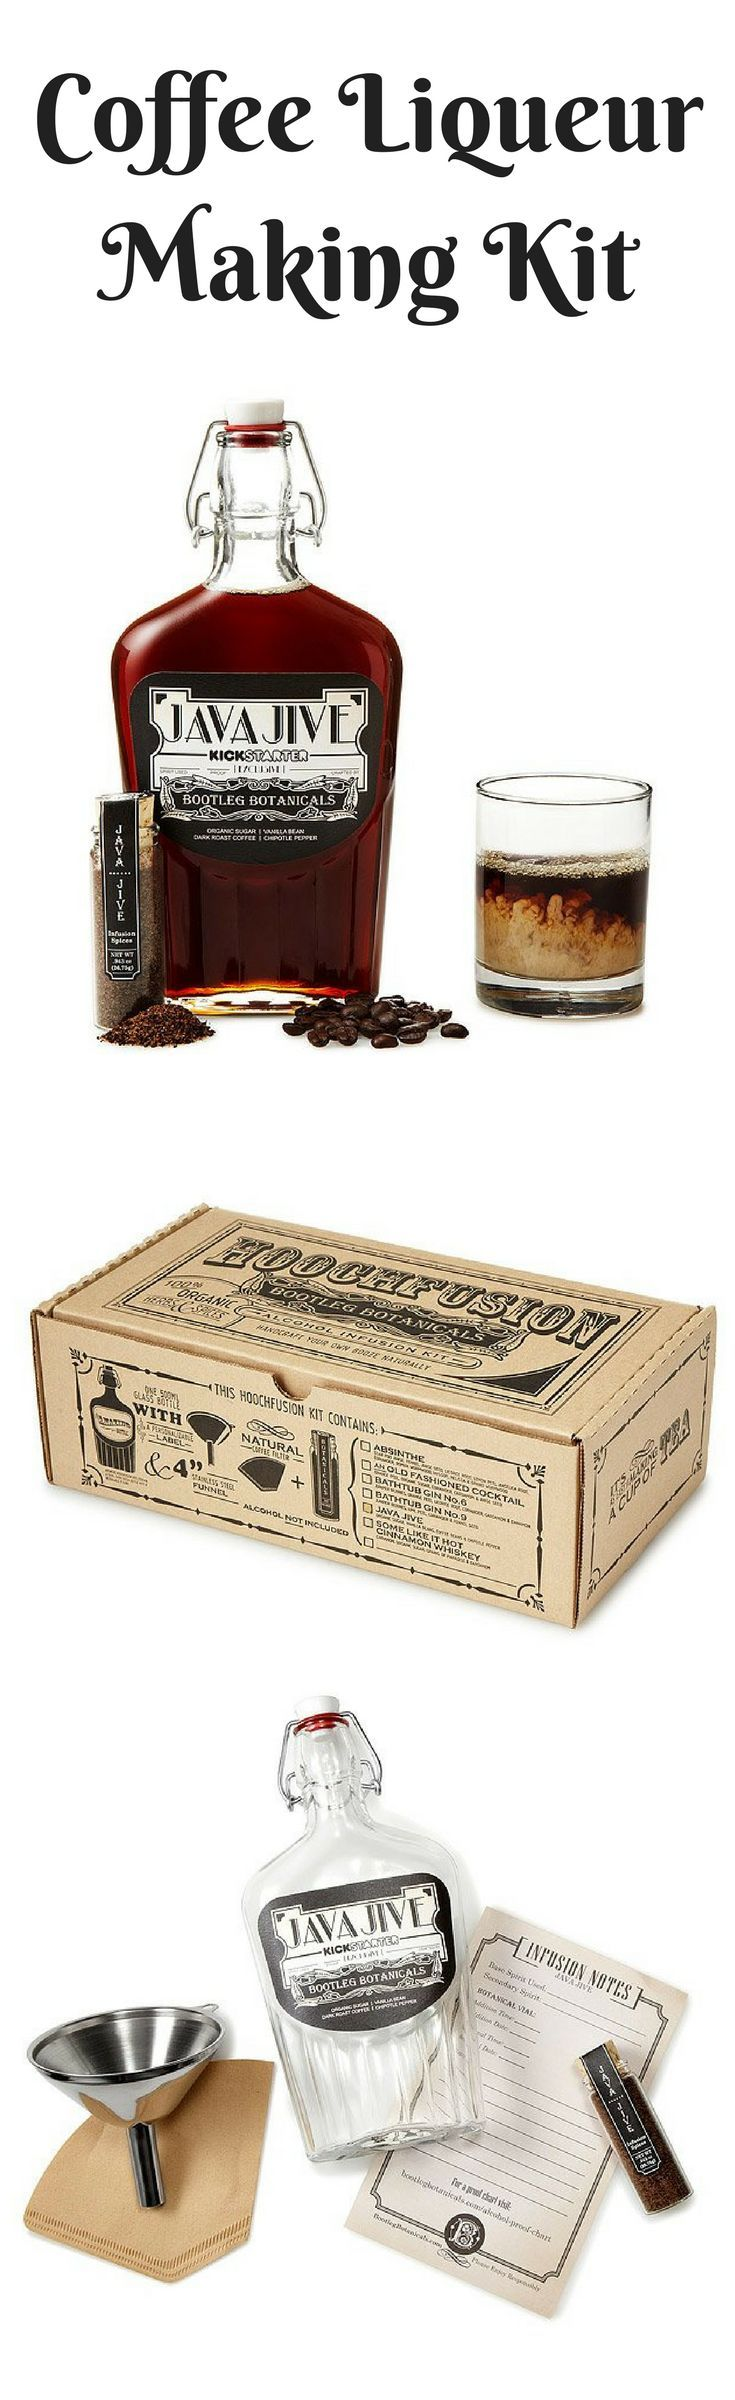 DIY Coffee Liqueur Making Kit  #ad #liqueur #cocktail #coffee #bar #gifts #giftidea #giftideas #giftsforhim #giftsfordad #groomsmengifts